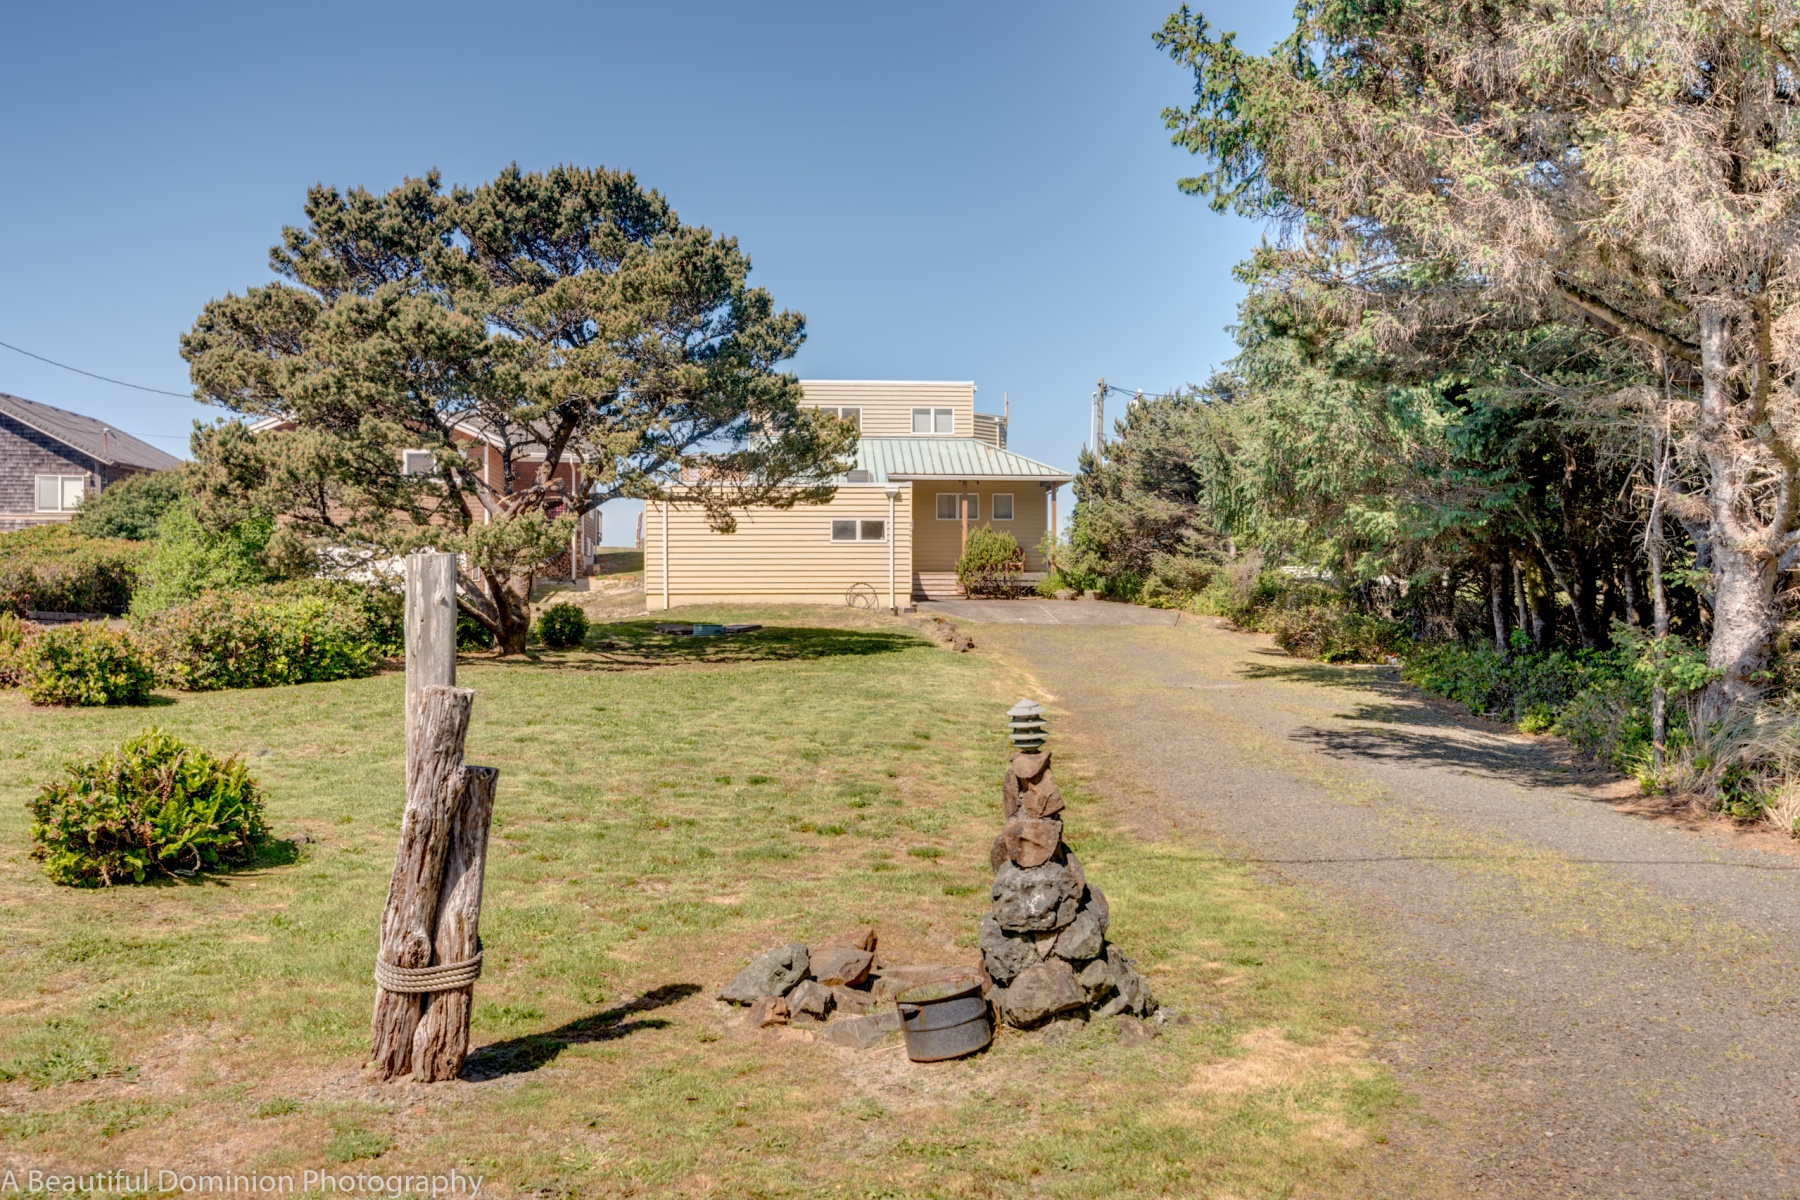 Single Family Home for Sale at 26450 BEACH DR, ROCKAWAY BEACH Rockaway Beach, Oregon, 97136 United States